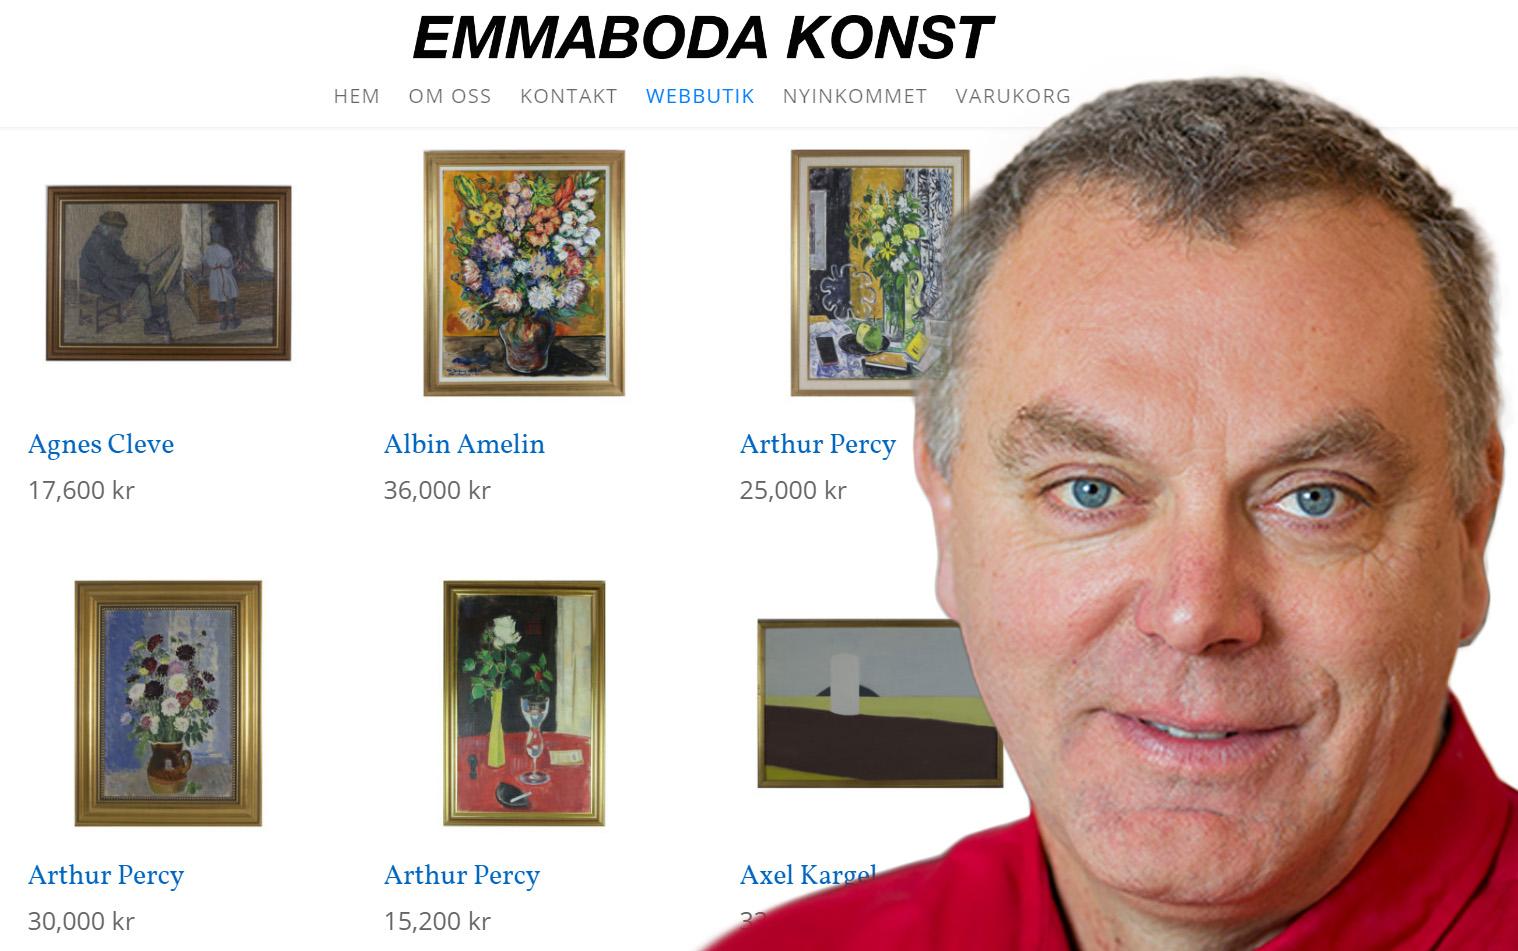 Sveriges största konstbutik öppnar e-handel